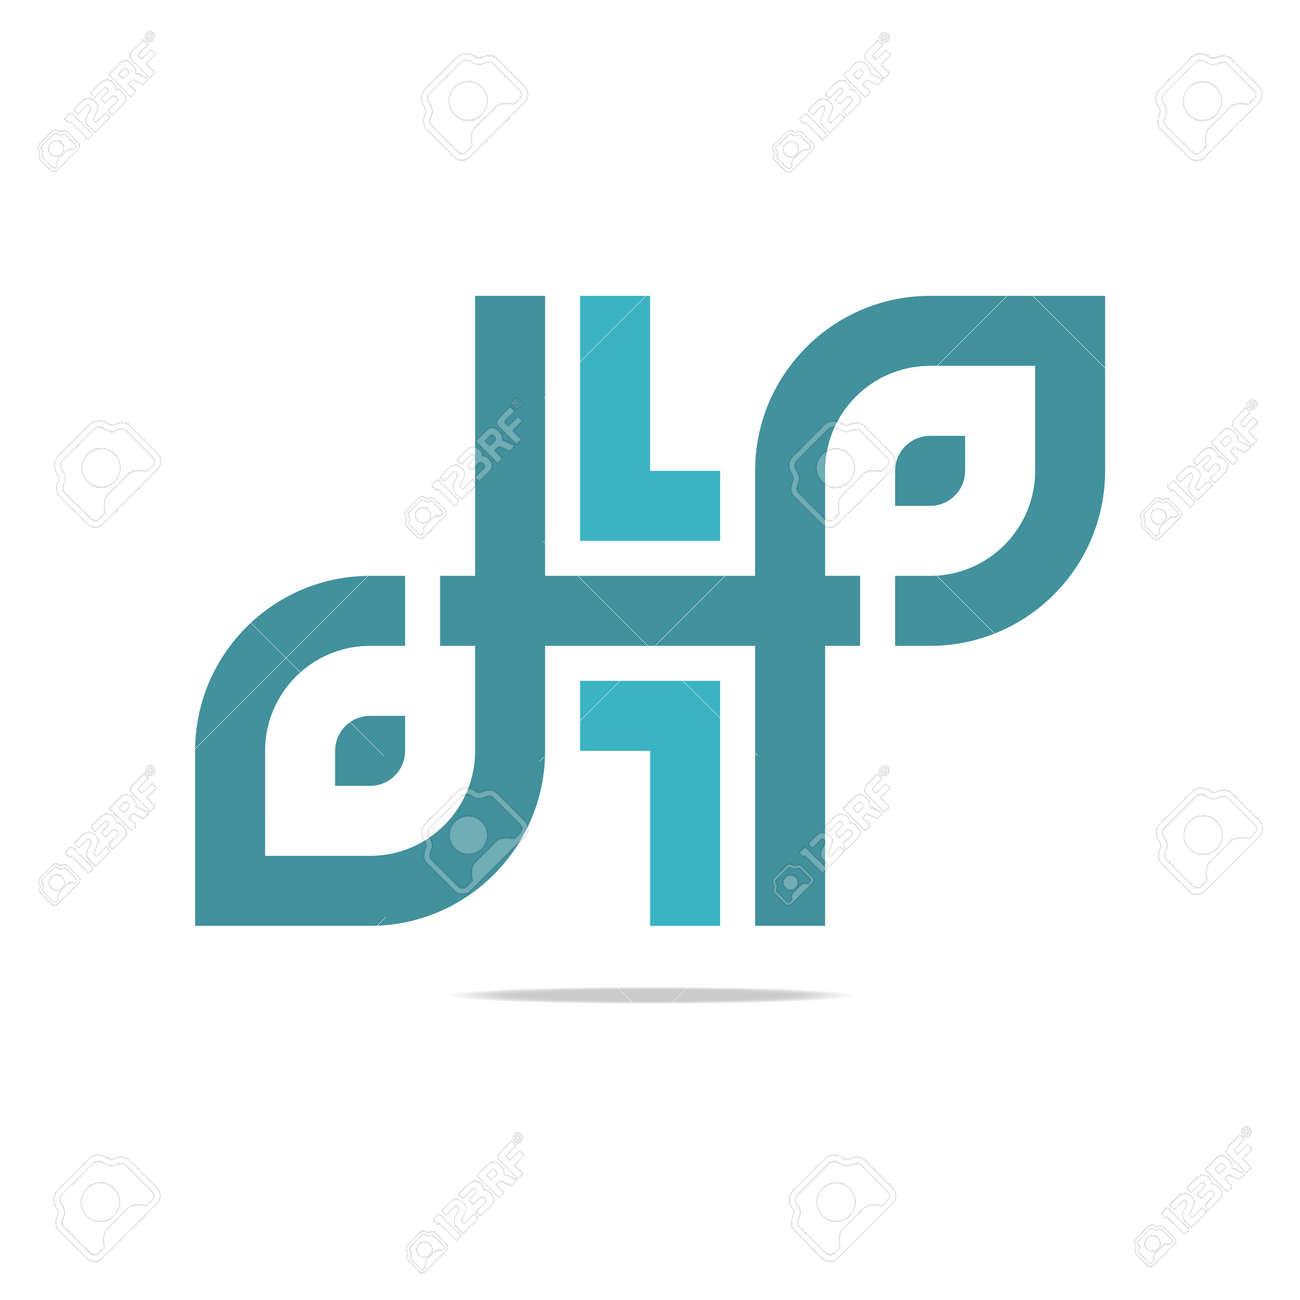 Logo design element company name bussines letter symbol icon logo design element company name bussines letter symbol icon stock vector 45245833 buycottarizona